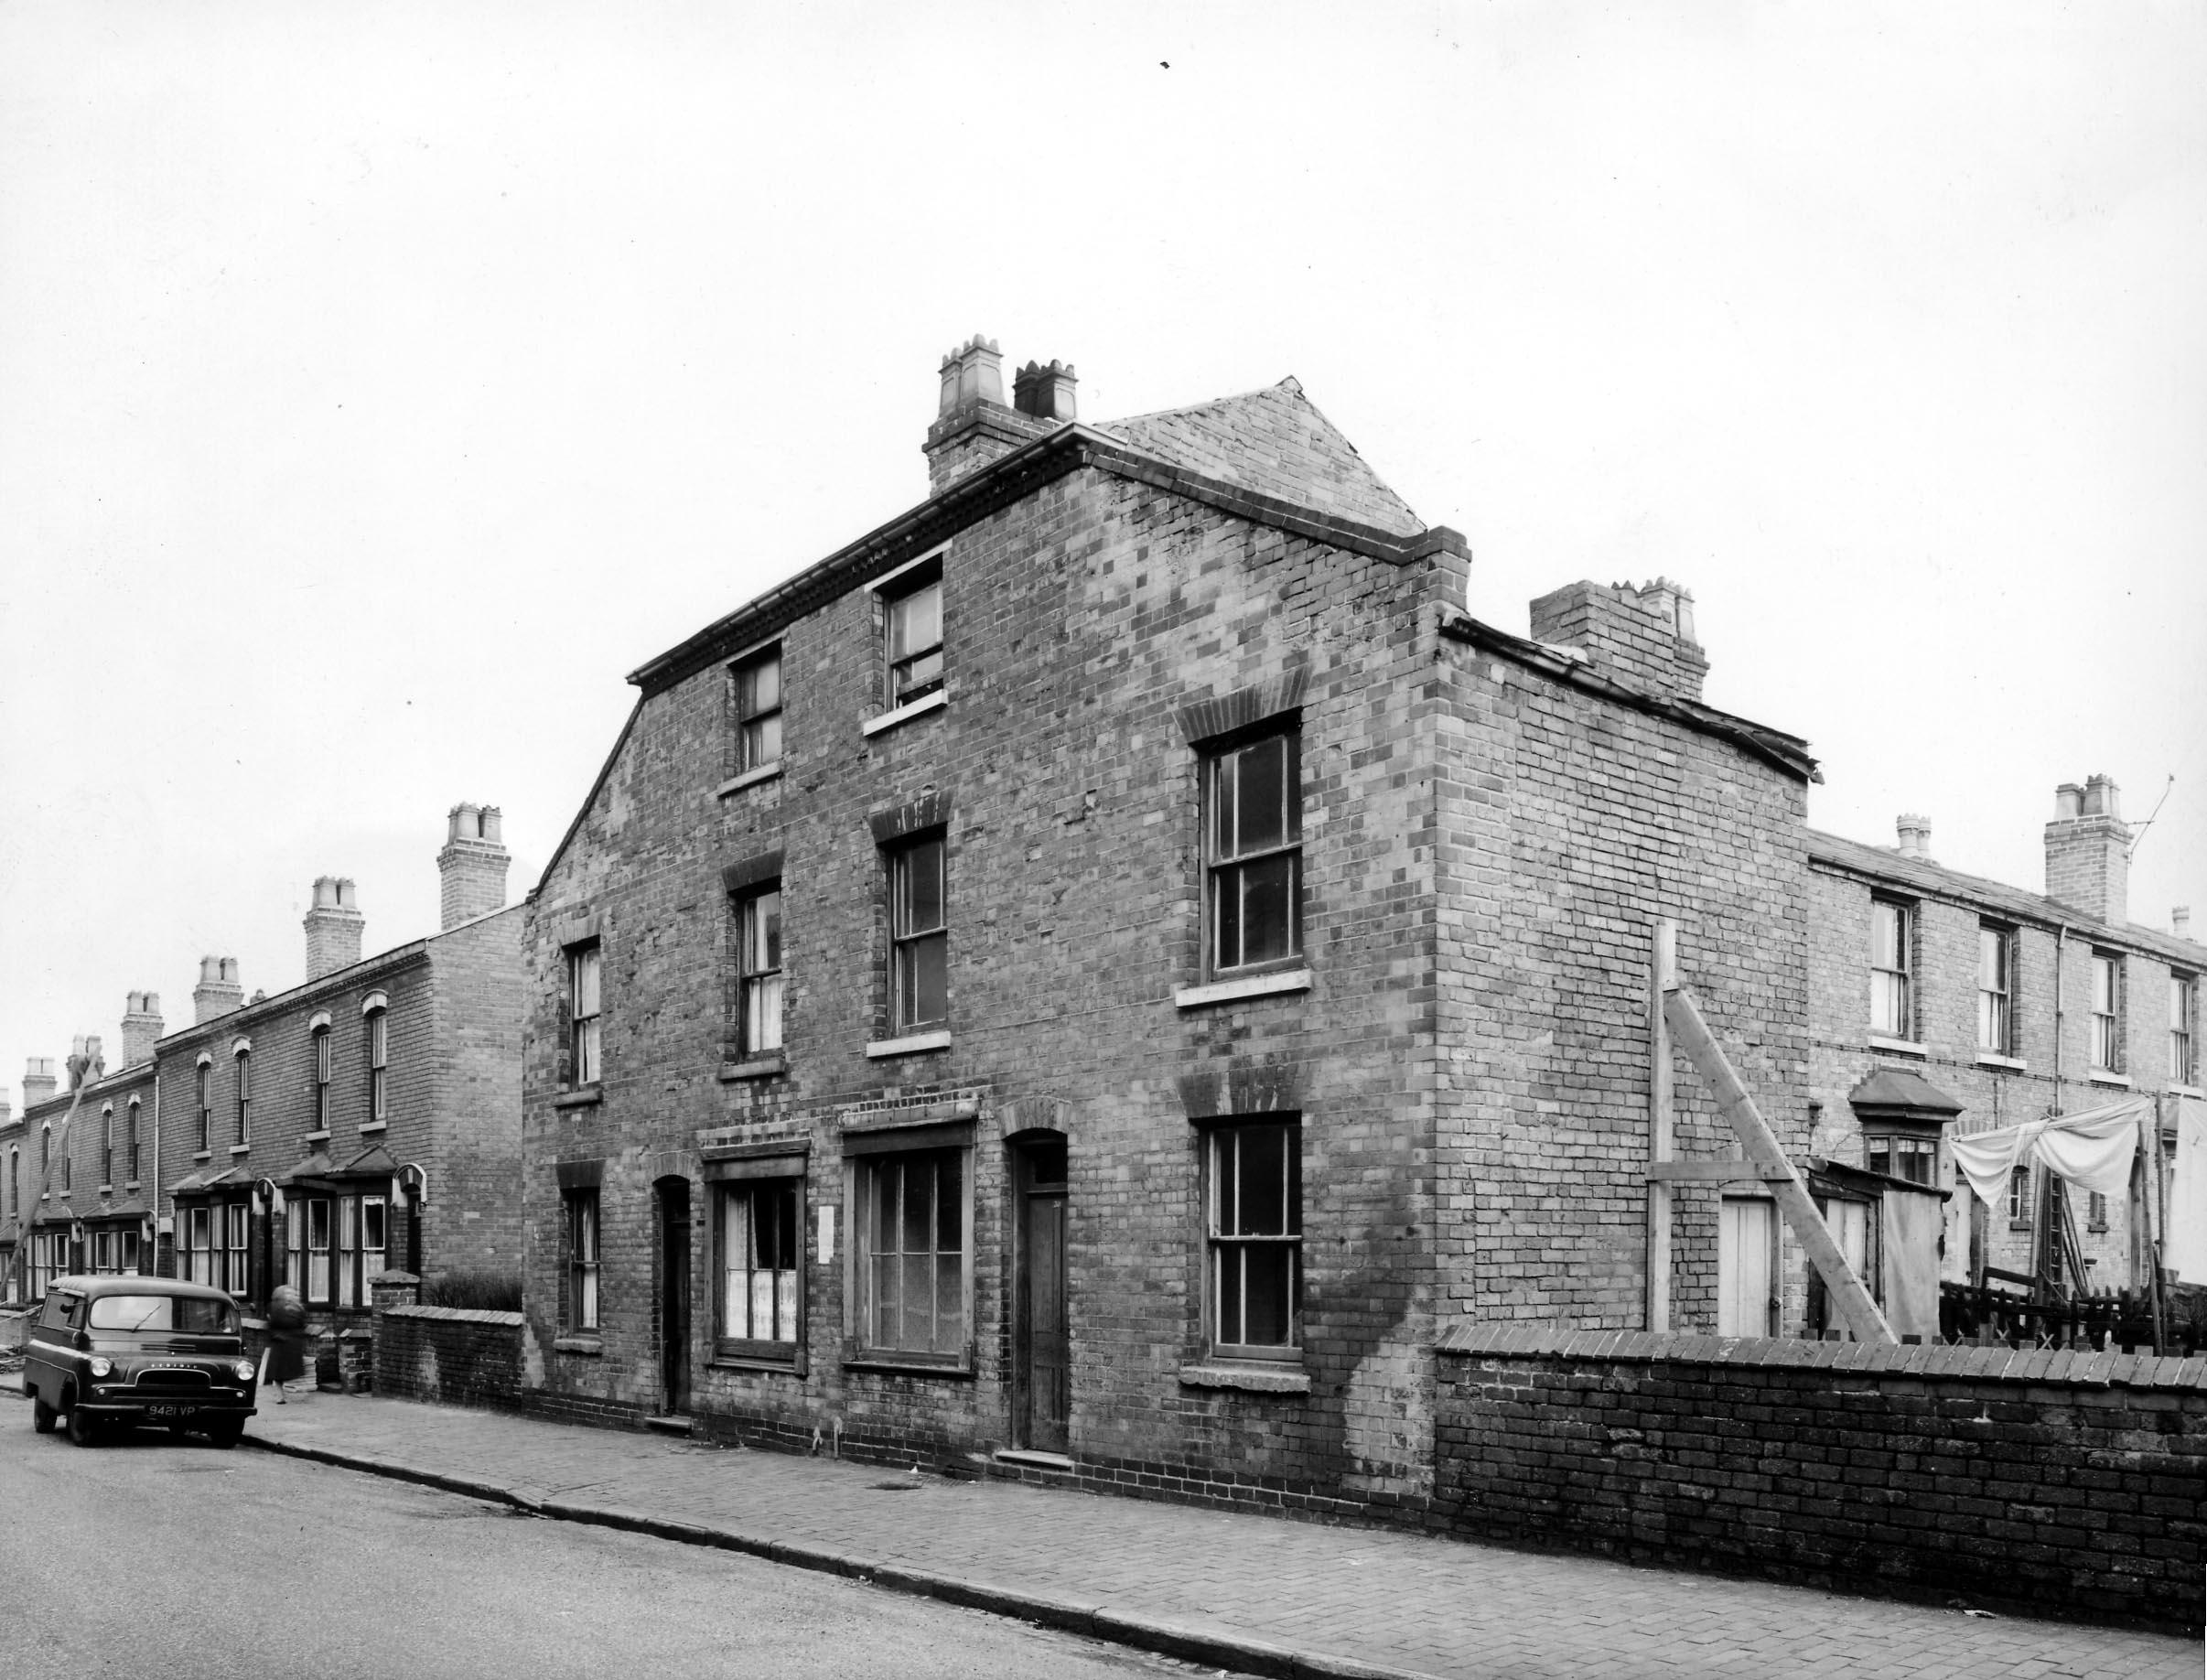 Dugdale Street No 30 Winson Green - 8-2-1962.jpg